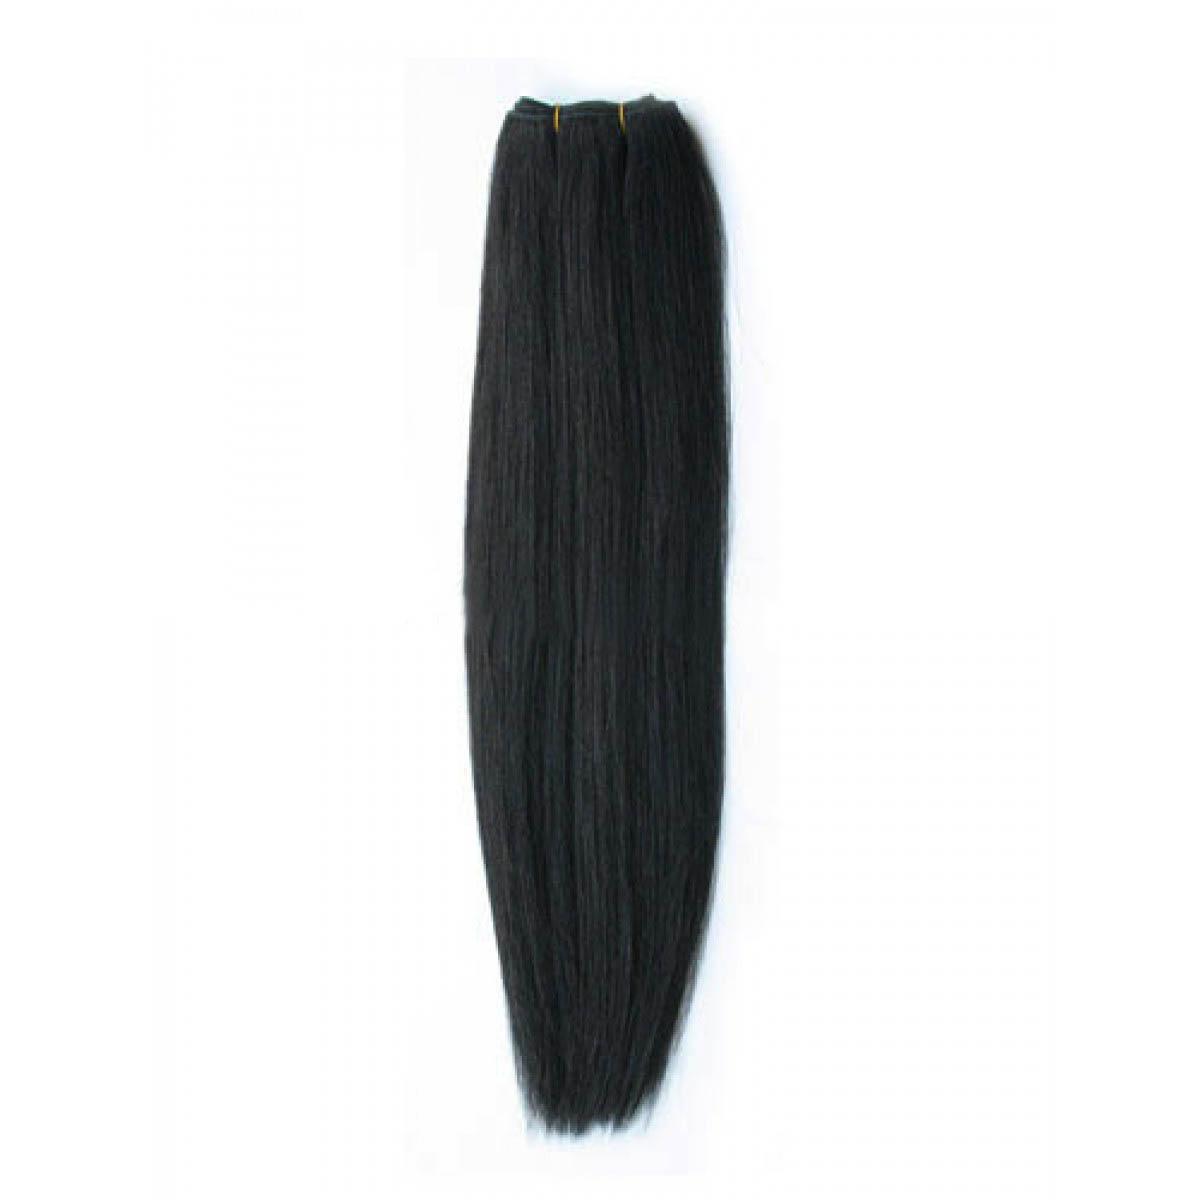 14 Inch #1b Natural Black Straight Brazilian Virgin Hair Wefts no 1